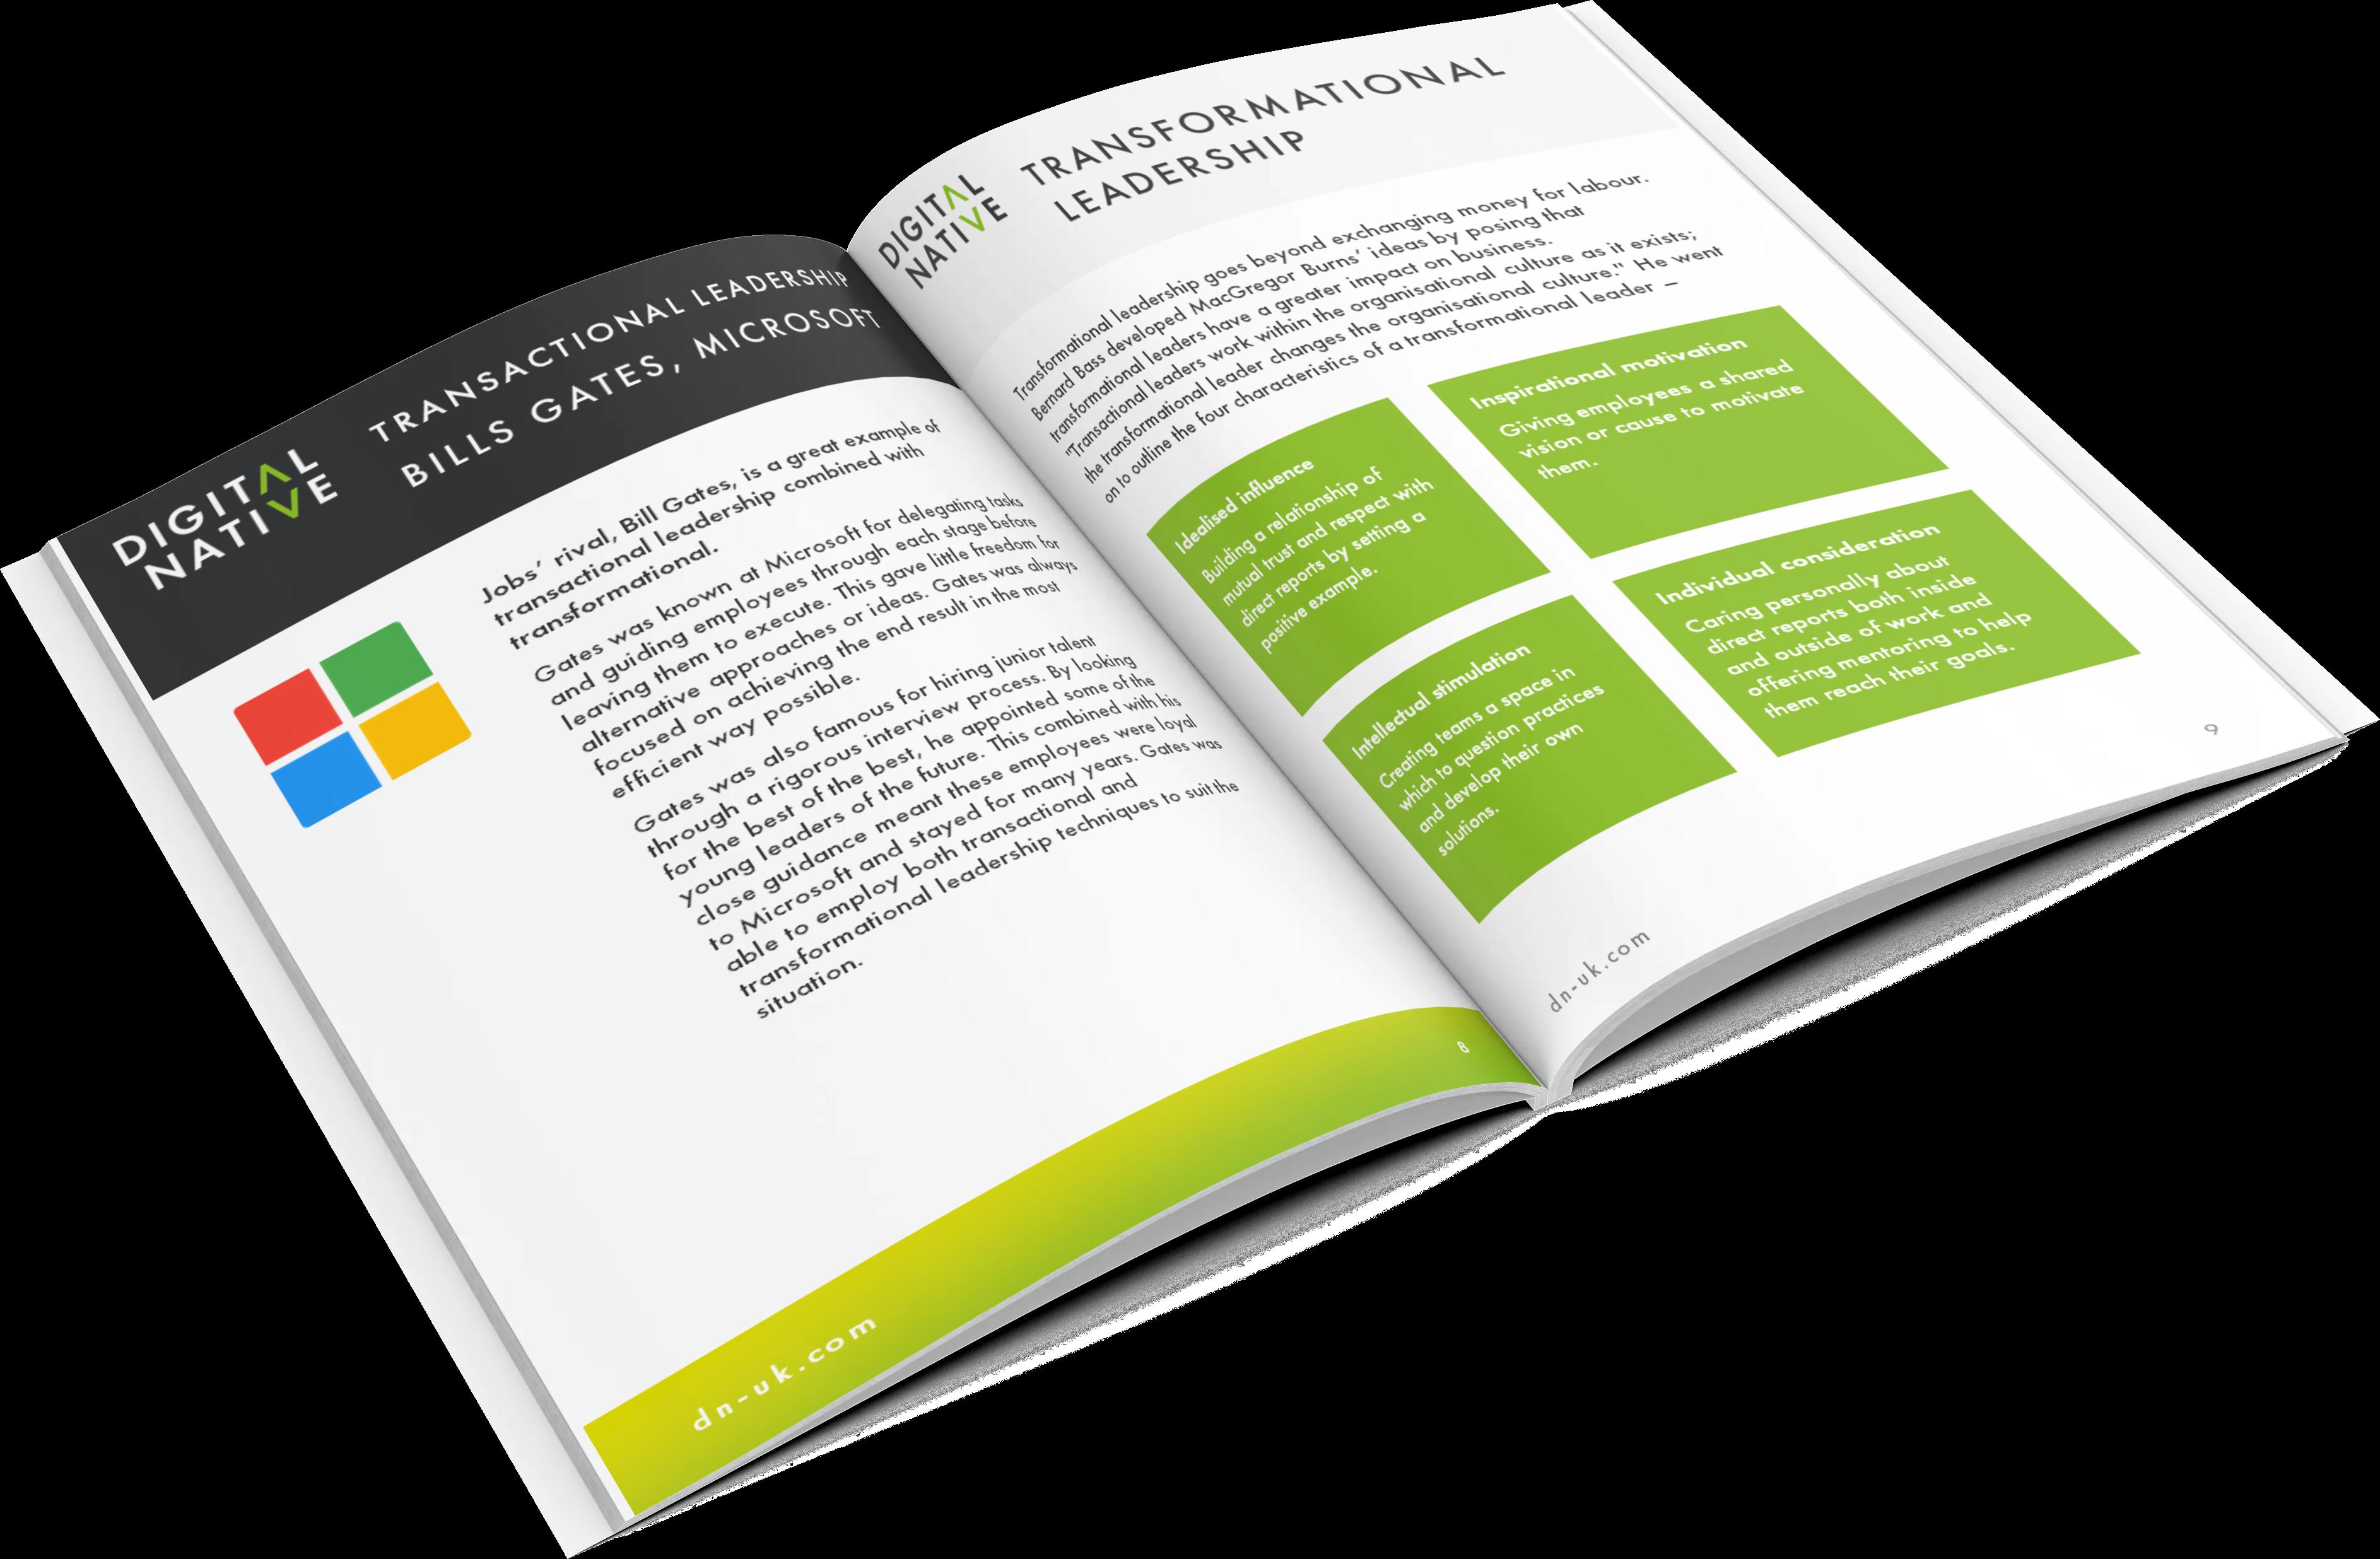 Transactions vs Transformational Leadership Mockup